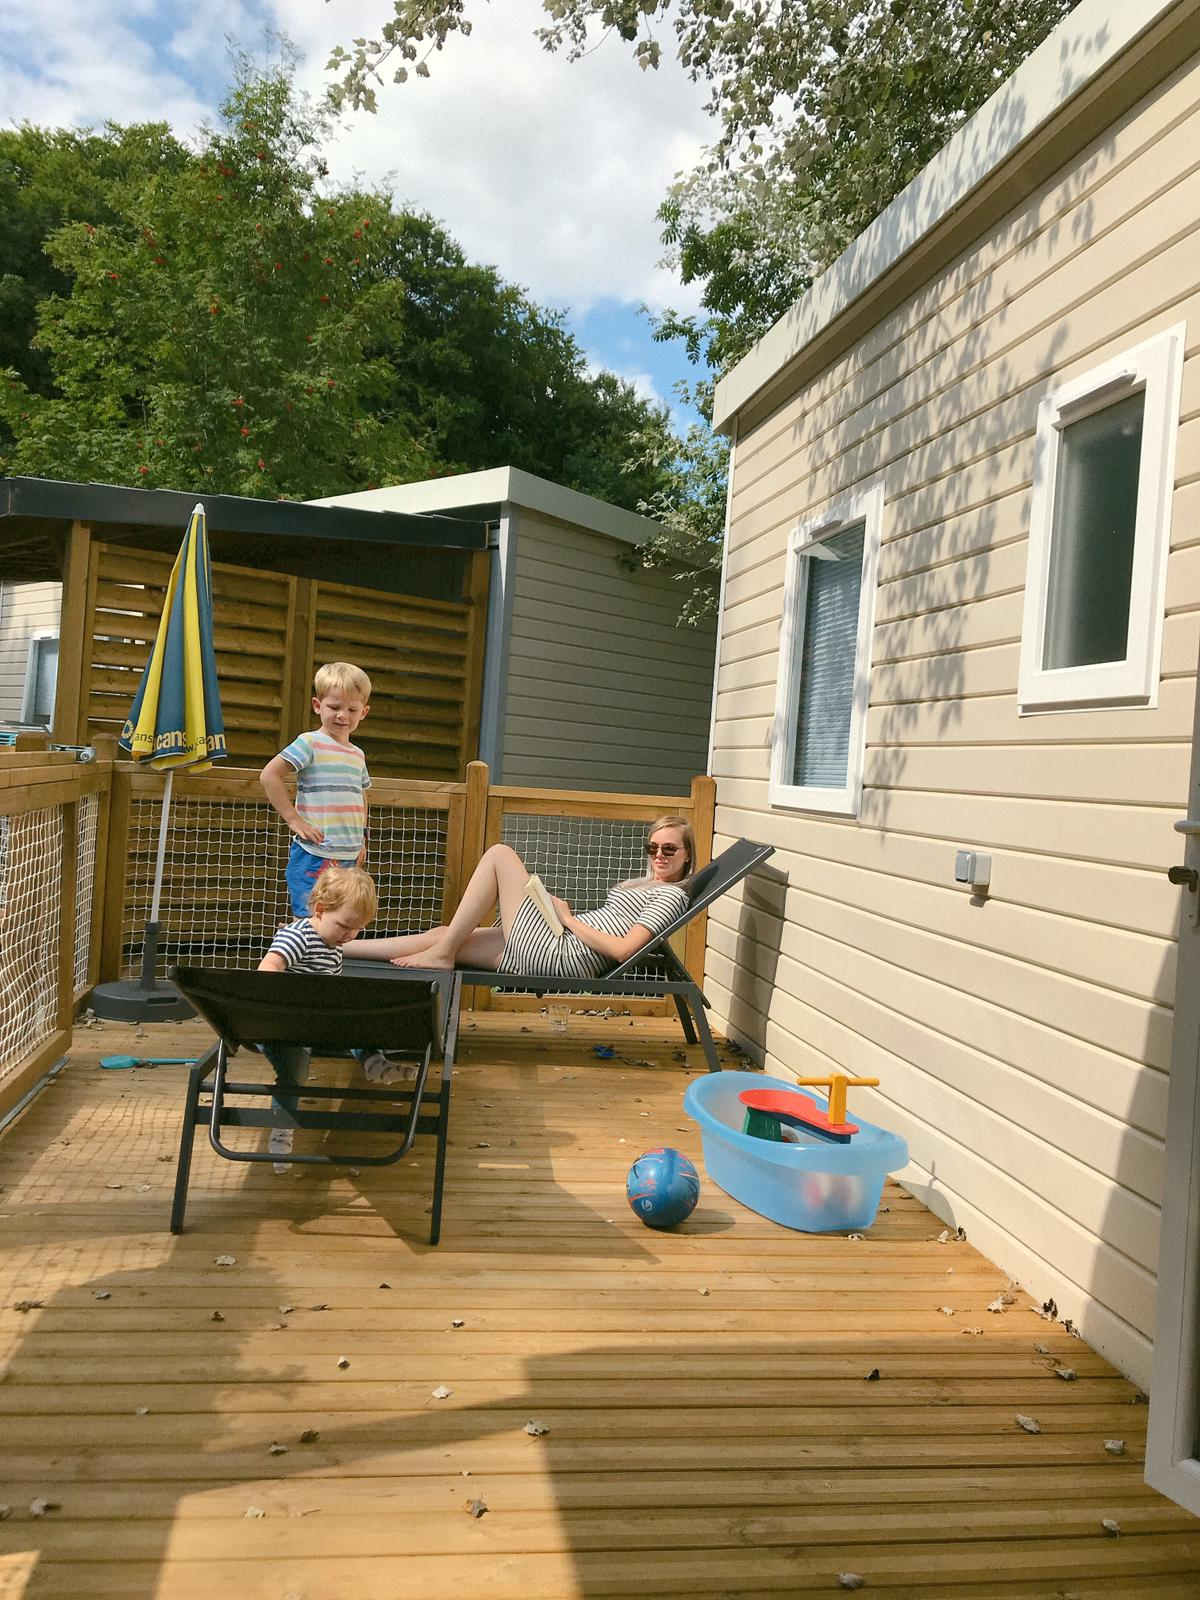 acb16c17 1e20 4c10 b397 1c8d368bd7f9 - Fotodagboek Vakantie: Camping Iris Parc Birkelt in Luxemburg!